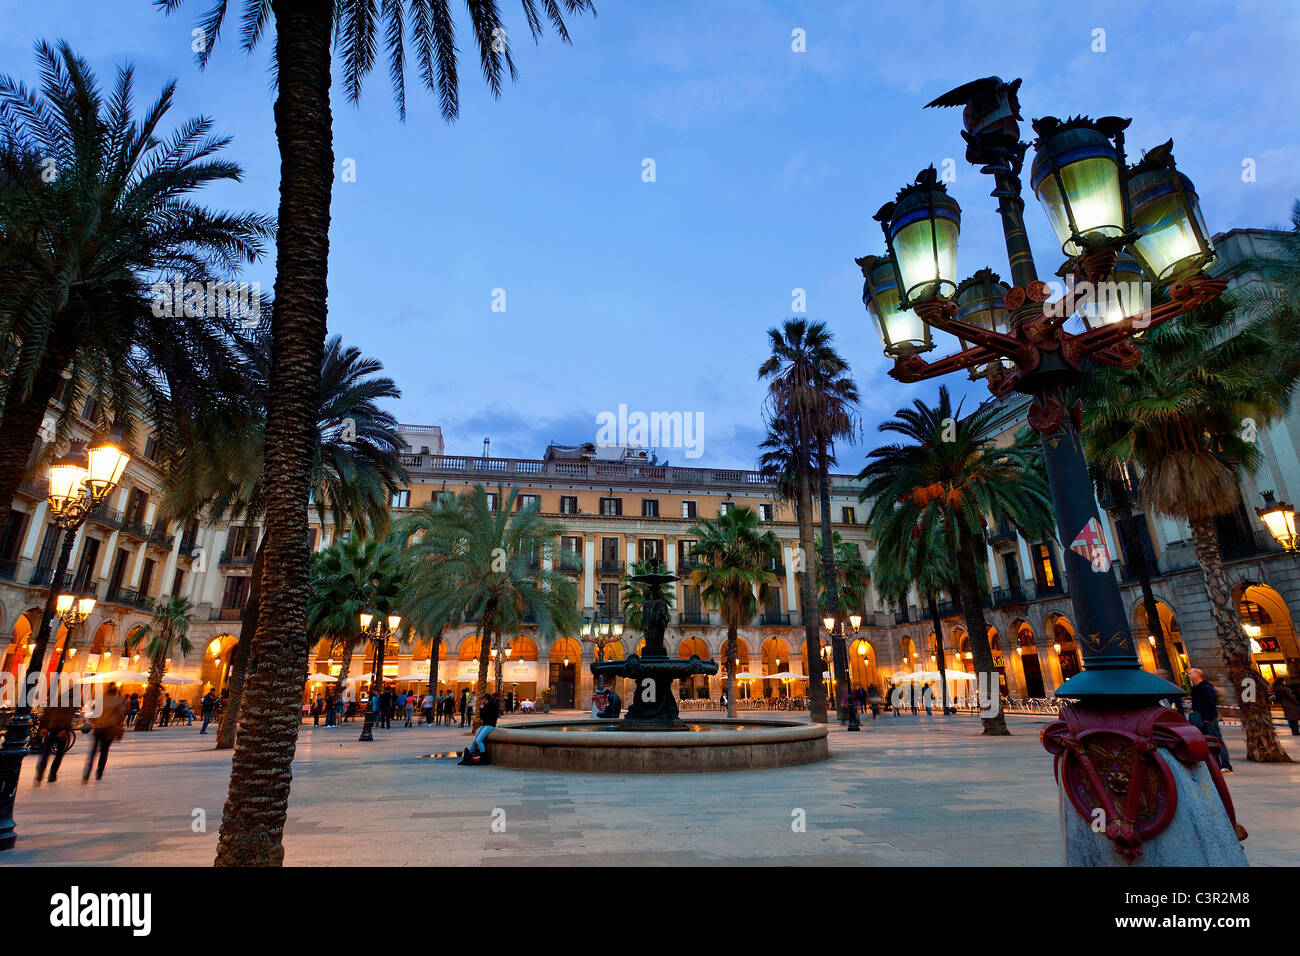 Spain, Catalonia, Barcelona, Barri Gotic district, Placa reial at Night - Stock Image